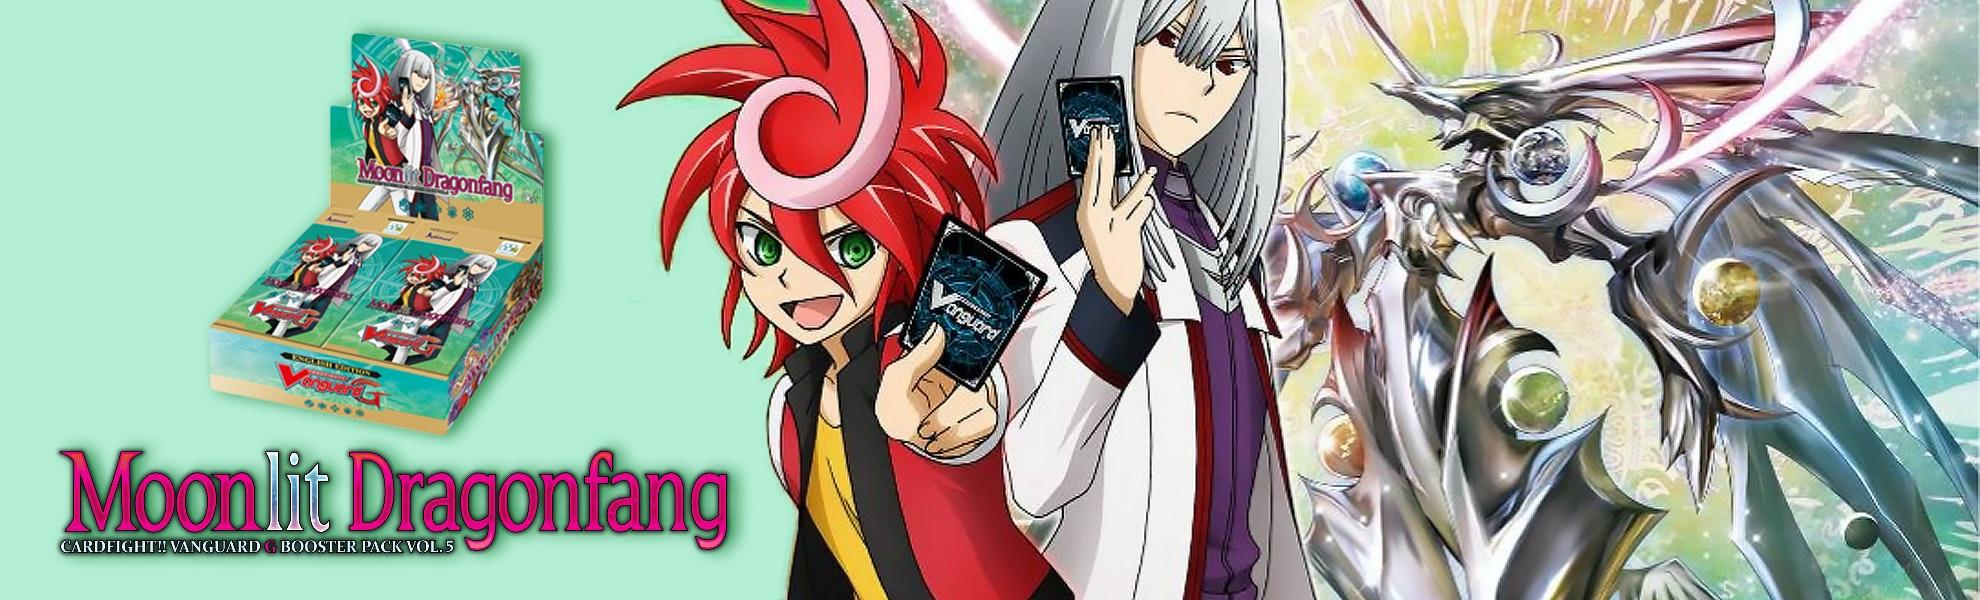 Cardfight!! Vanguard - Moonlit Dragonfang G Booster